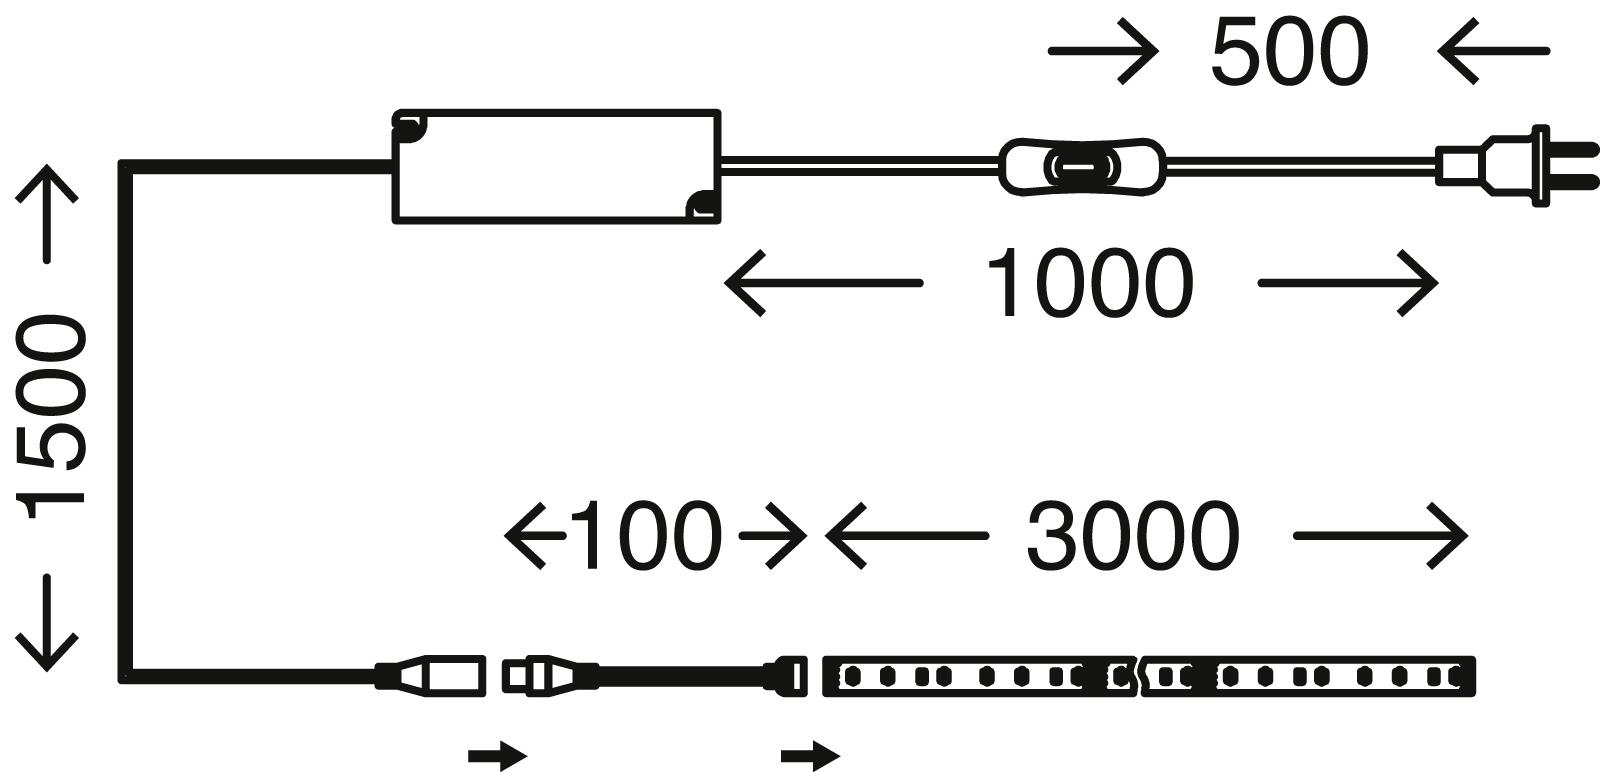 LED Flexband, 3 Meter, 42 W, Silber